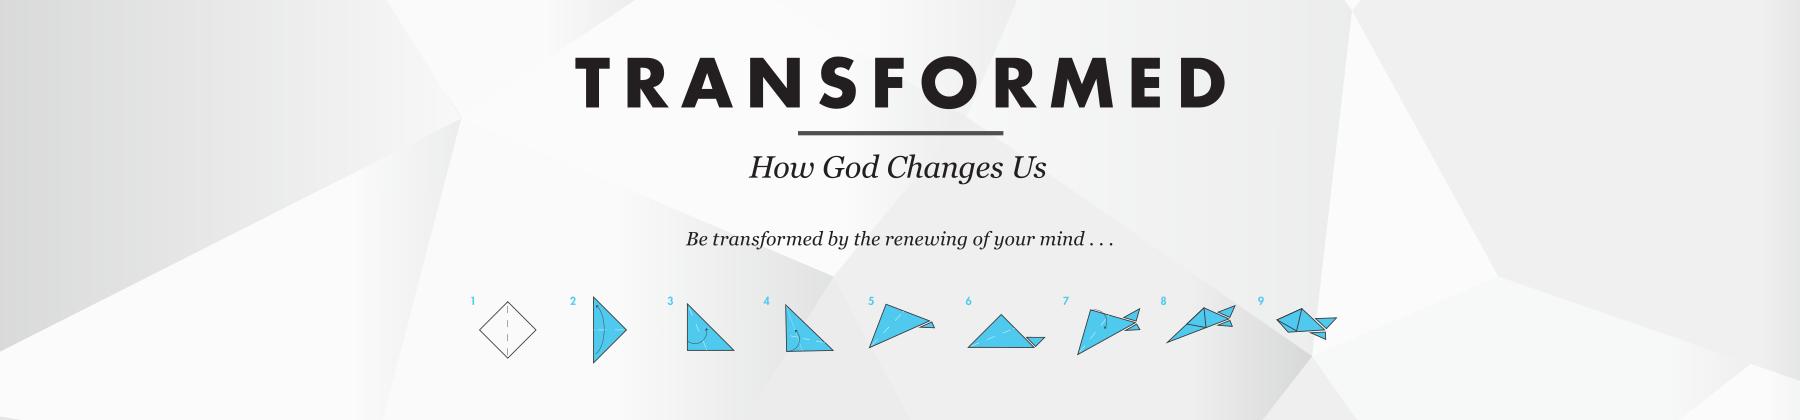 Transformed-web-banner